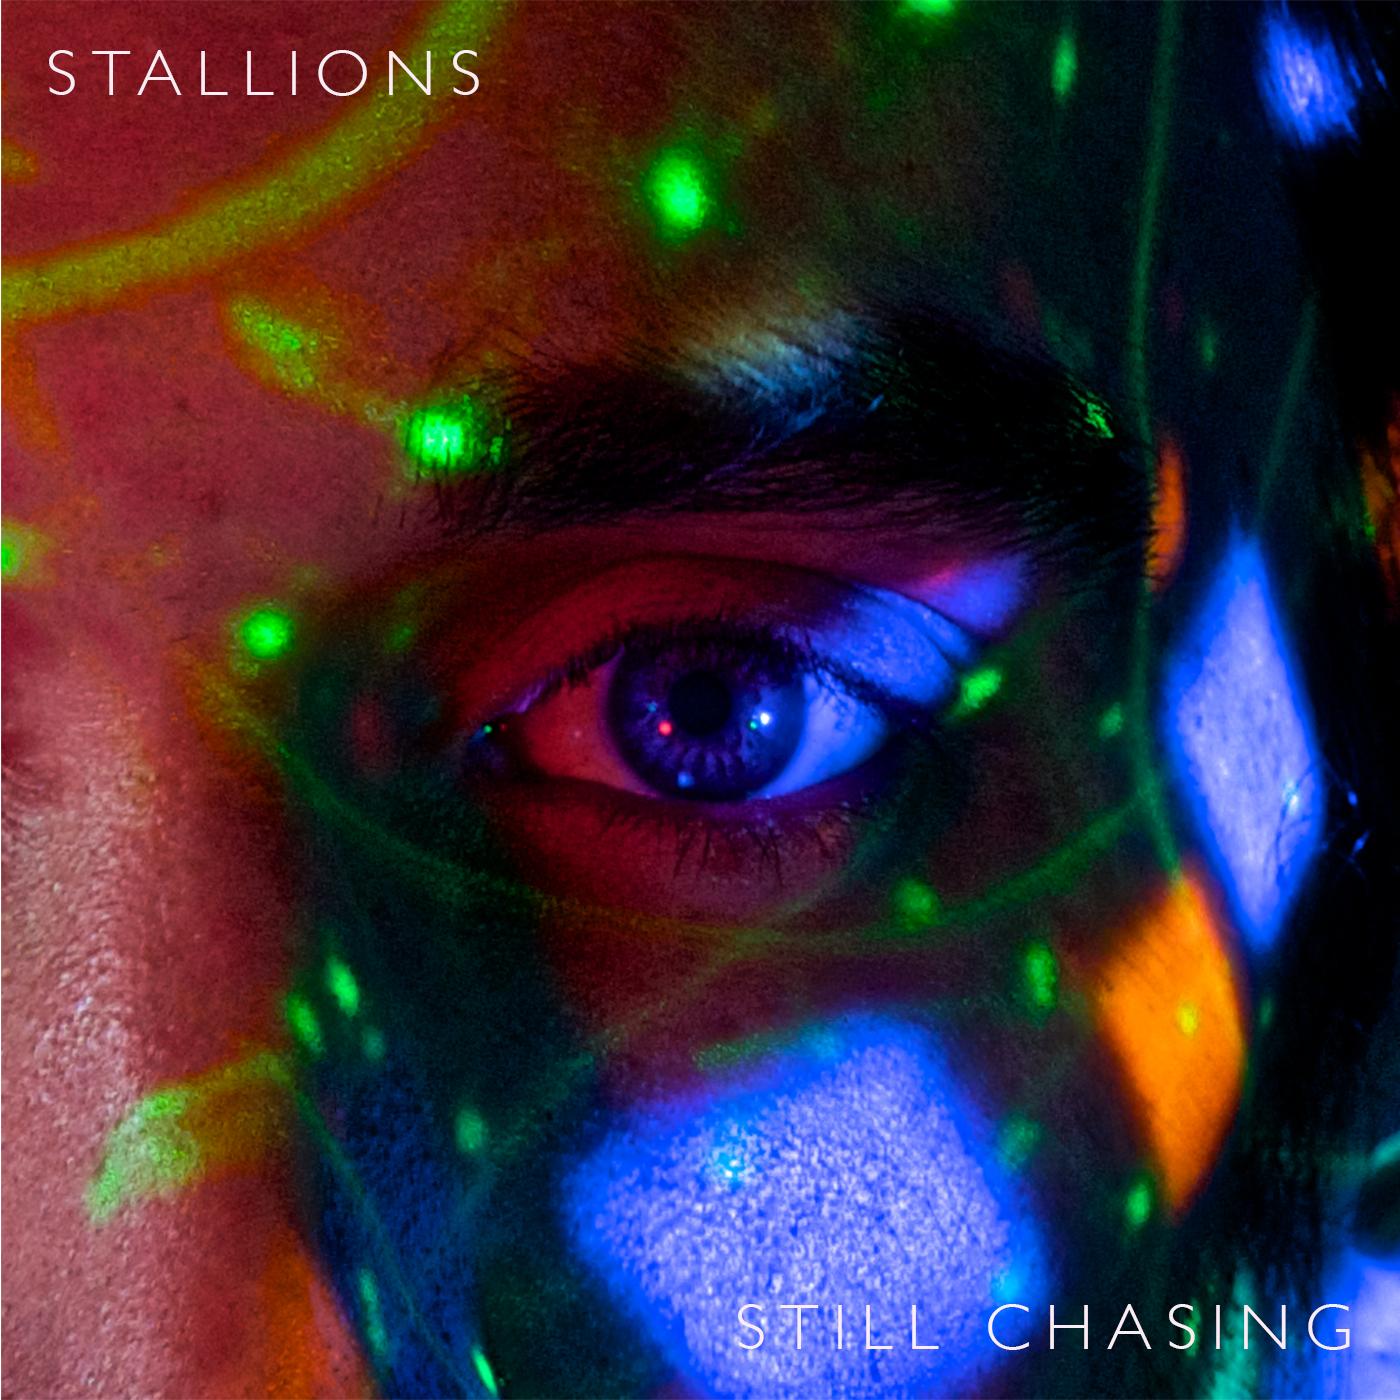 Photo: Stallions